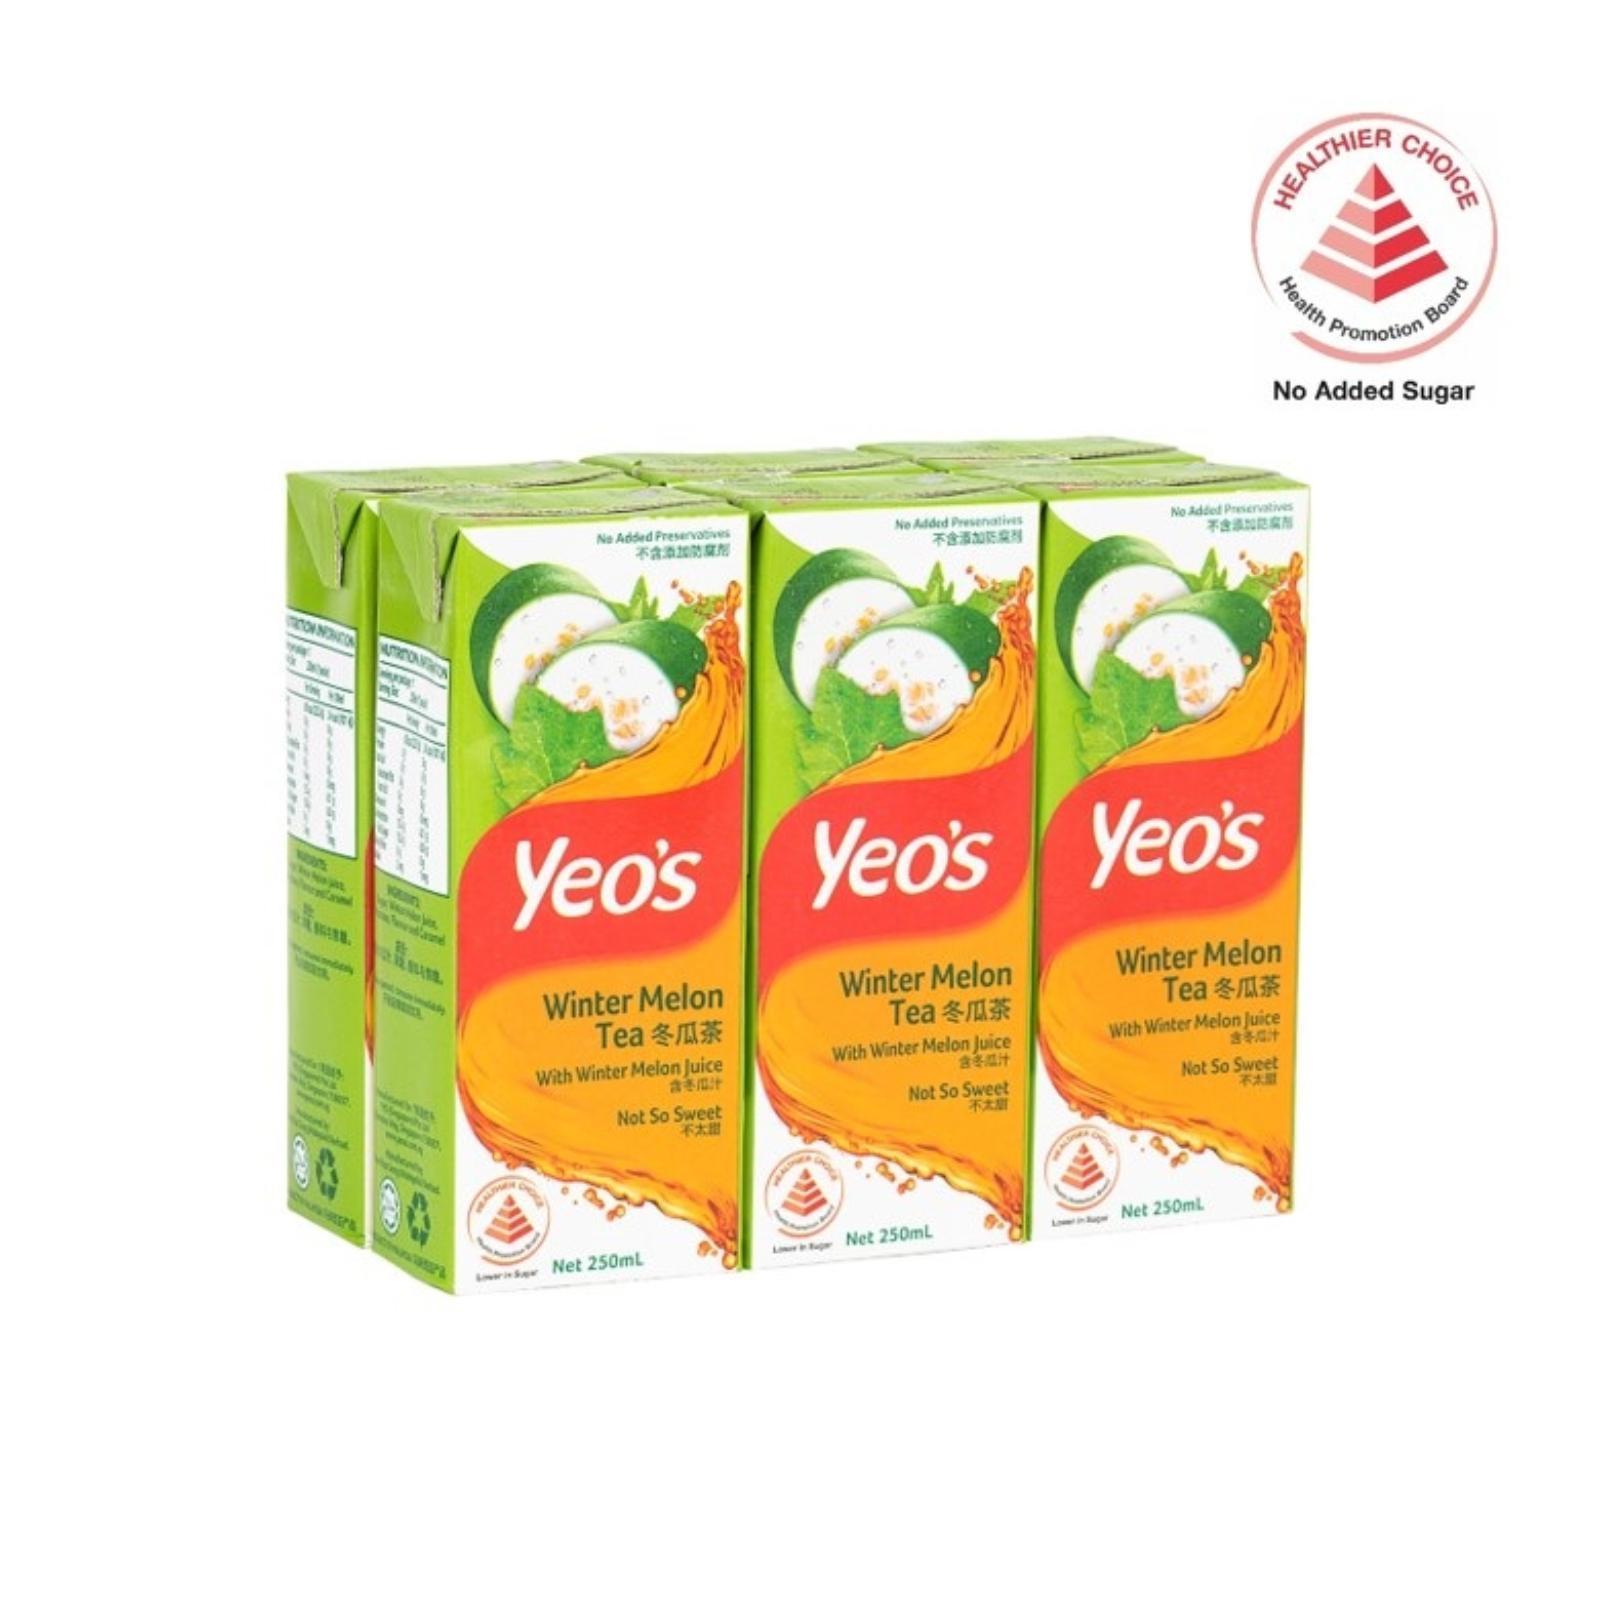 Yeo's Wintermelon Tea